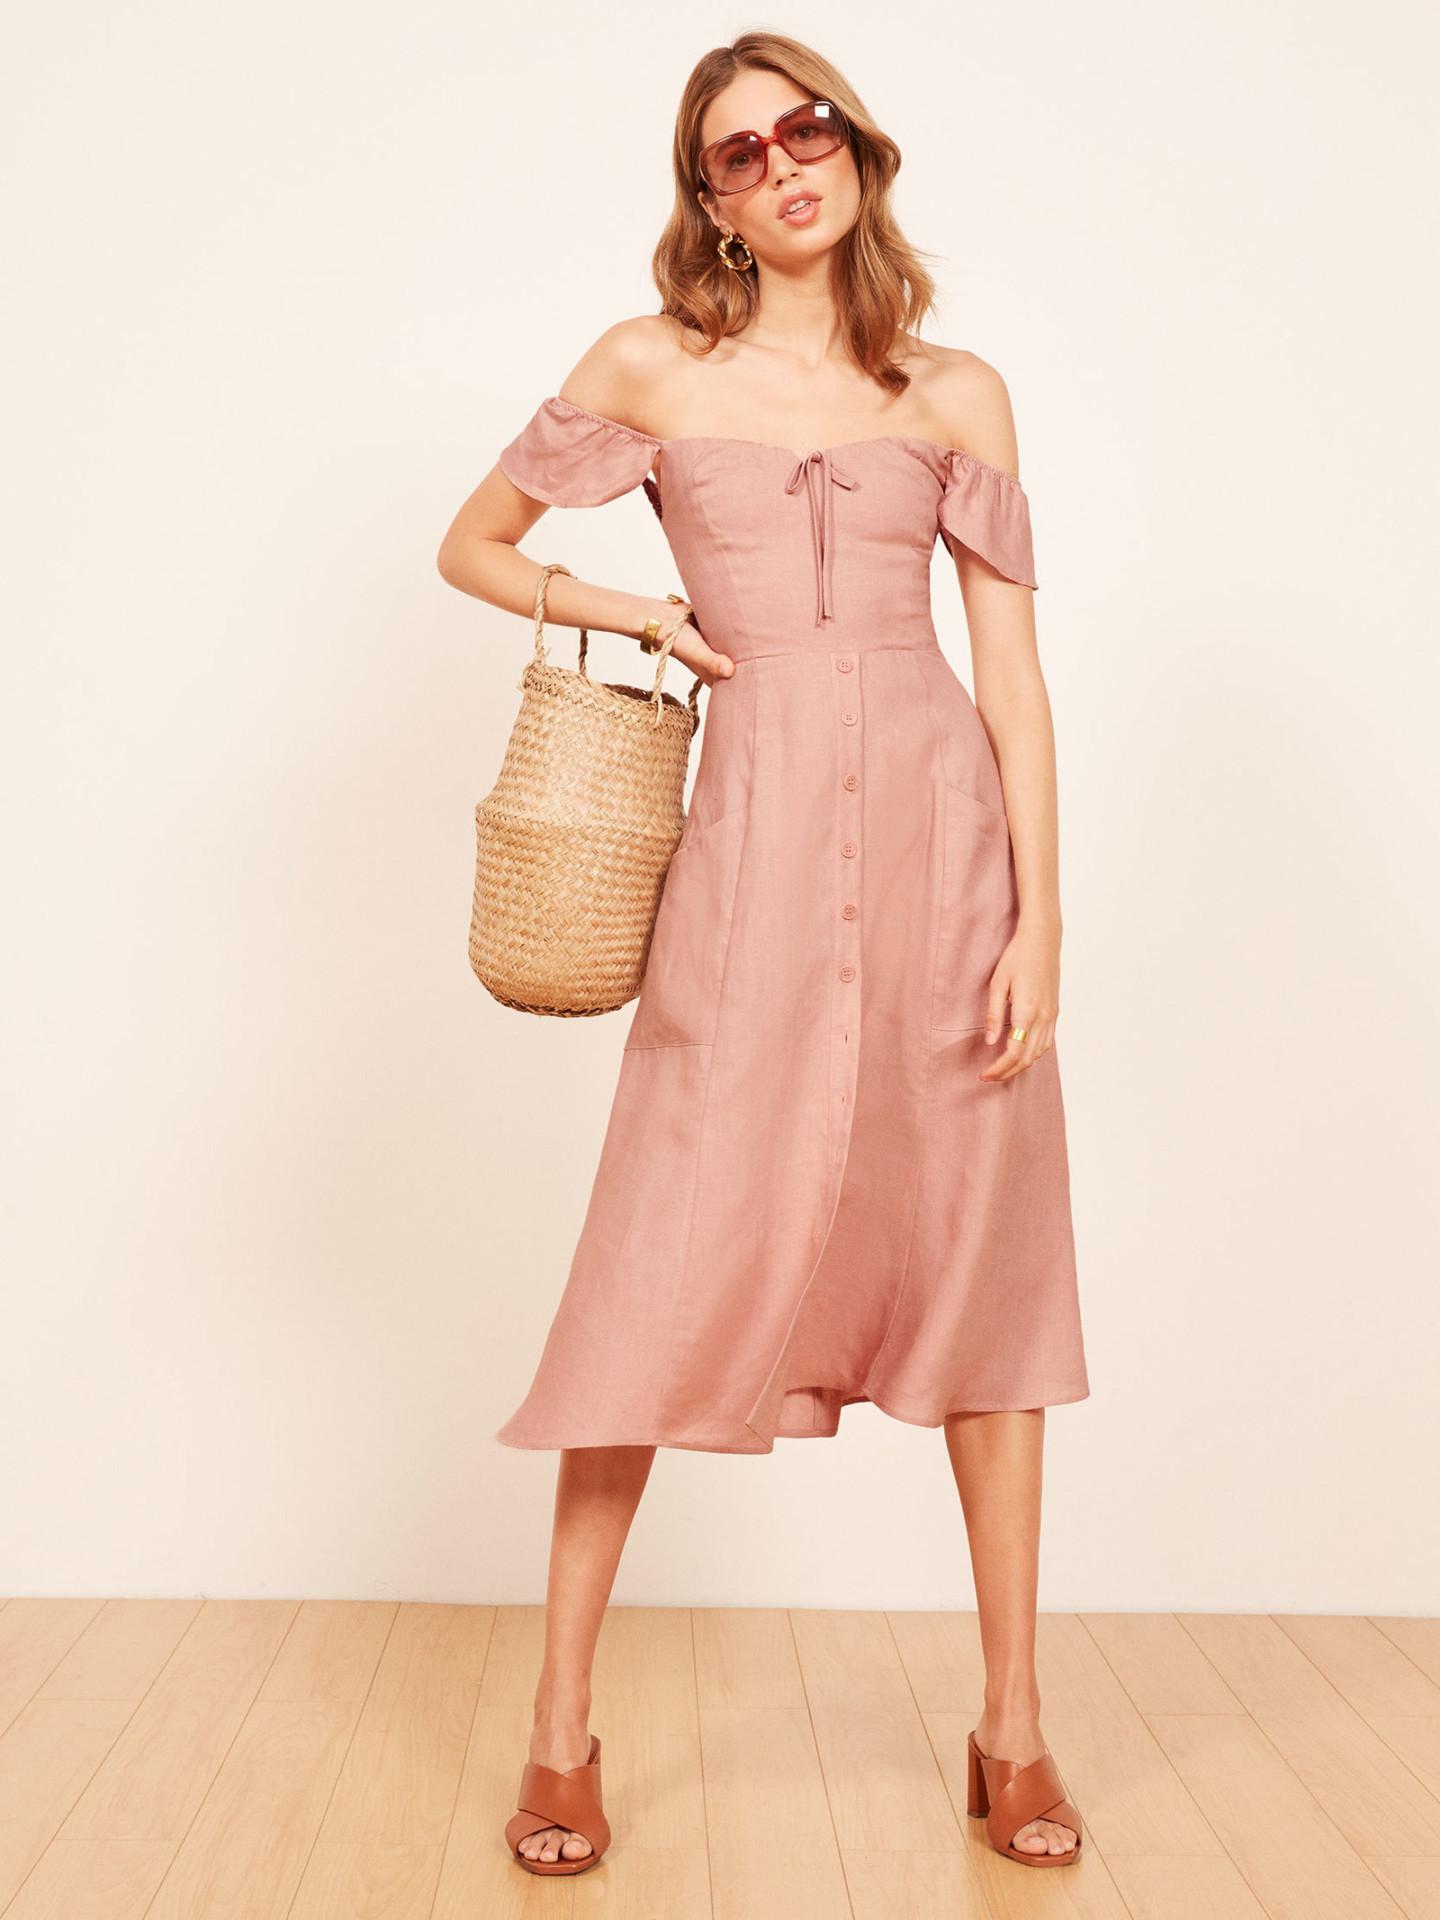 THE REFORMATION Francis Blush Dress